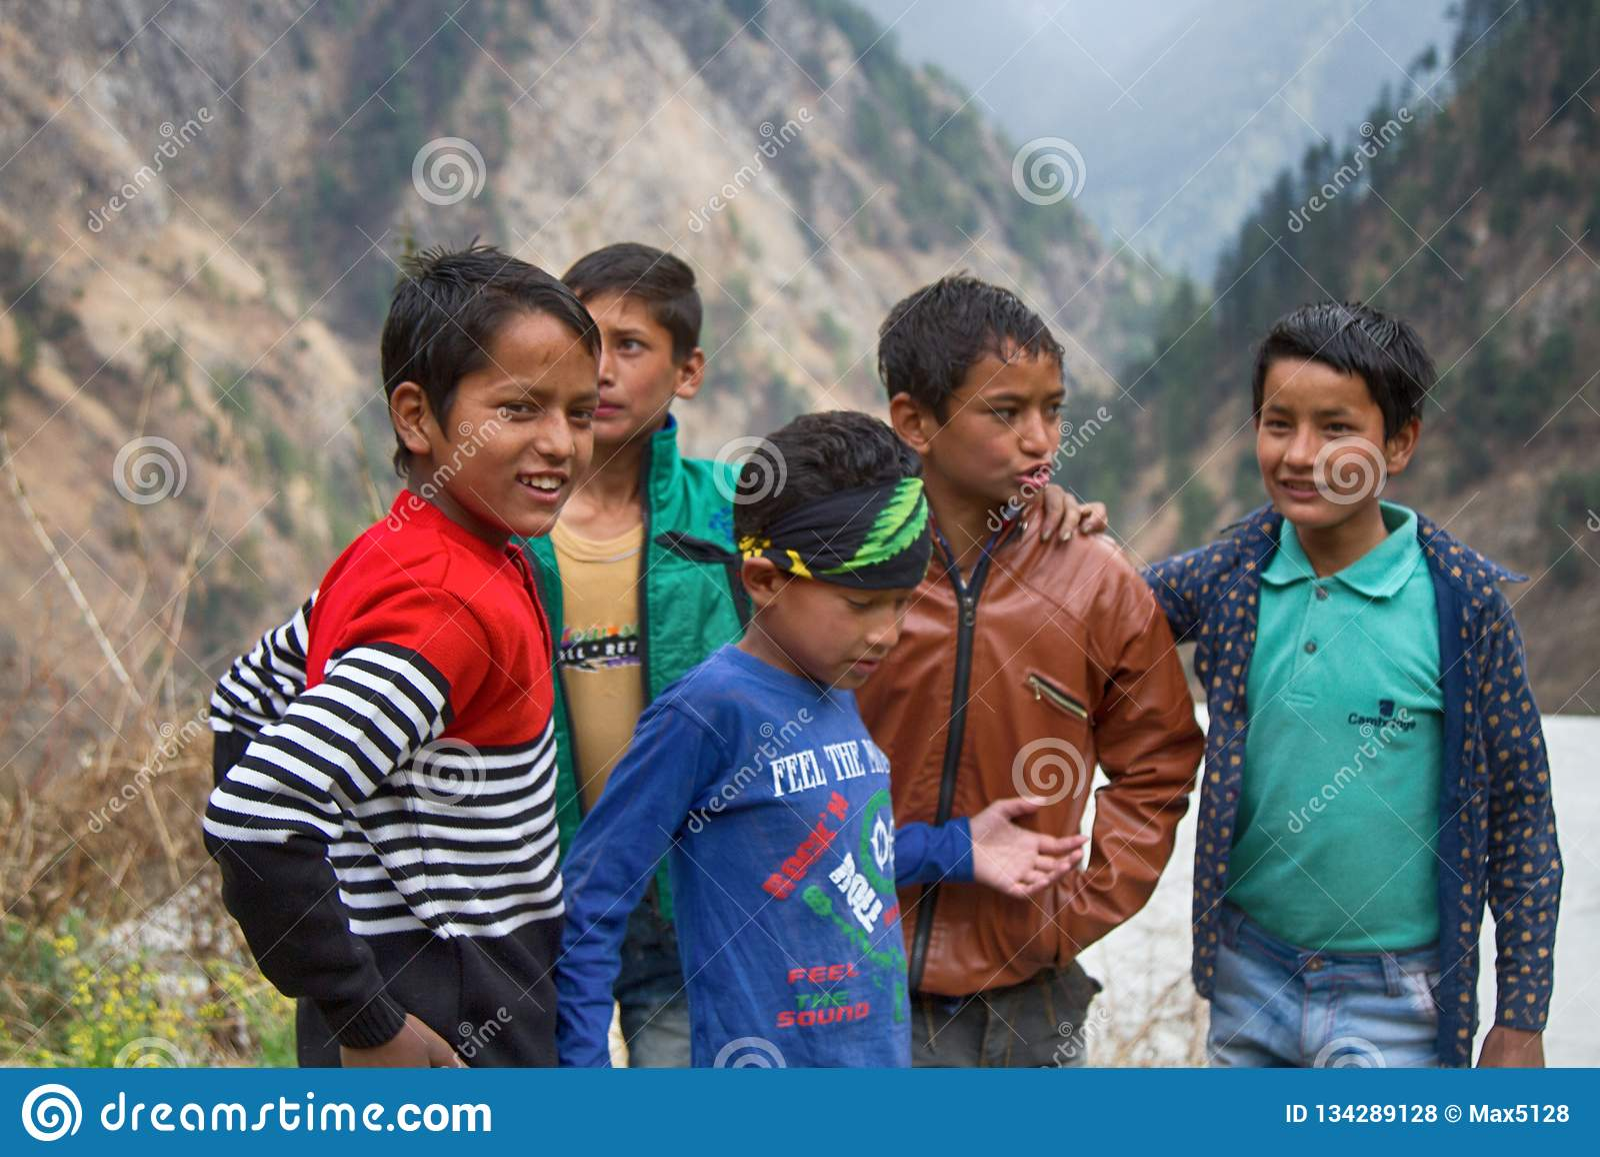 indian village group